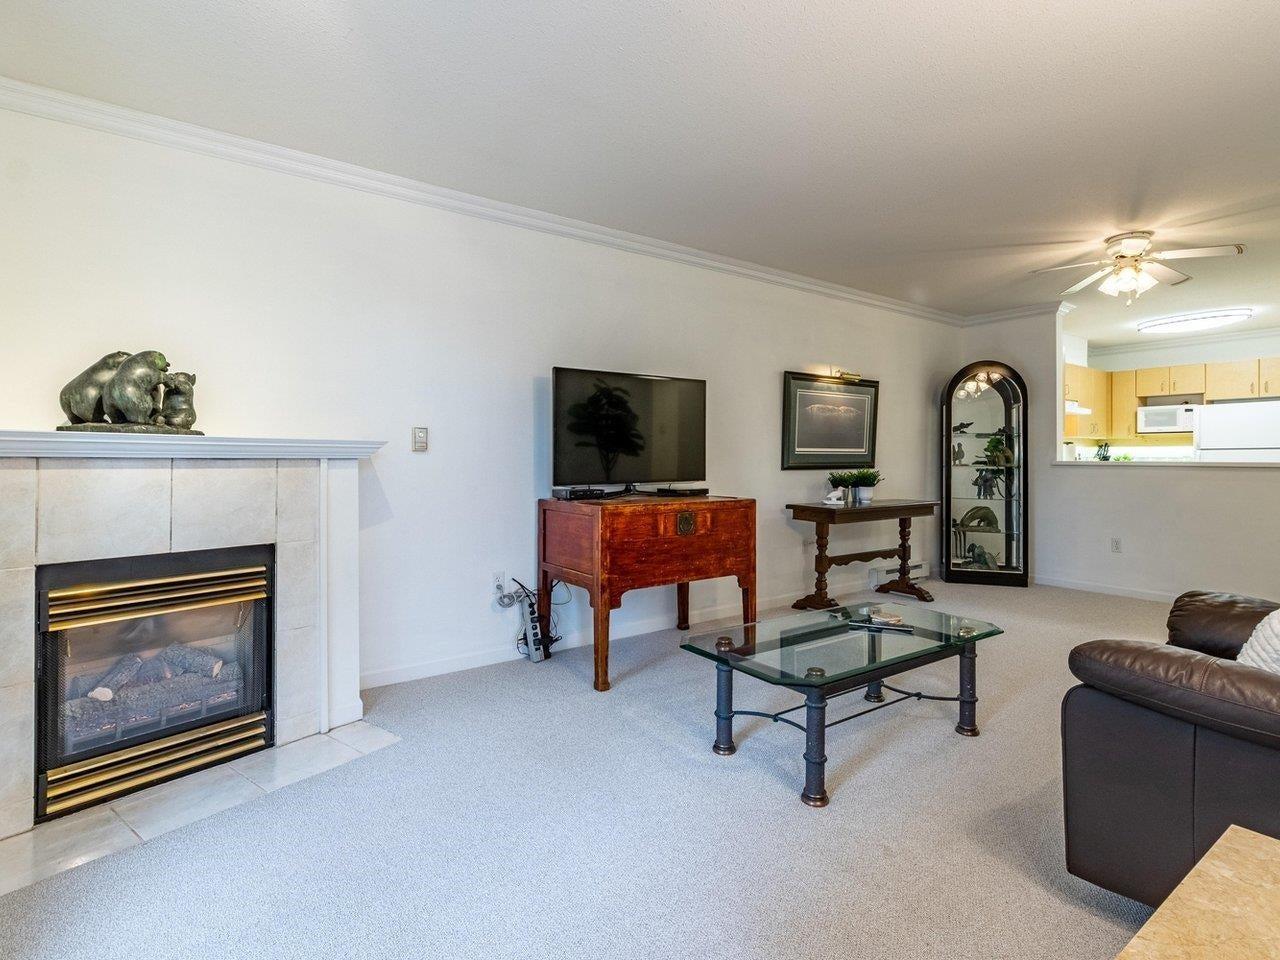 306 15298 20 AVENUE - King George Corridor Apartment/Condo for sale, 2 Bedrooms (R2625551) - #15